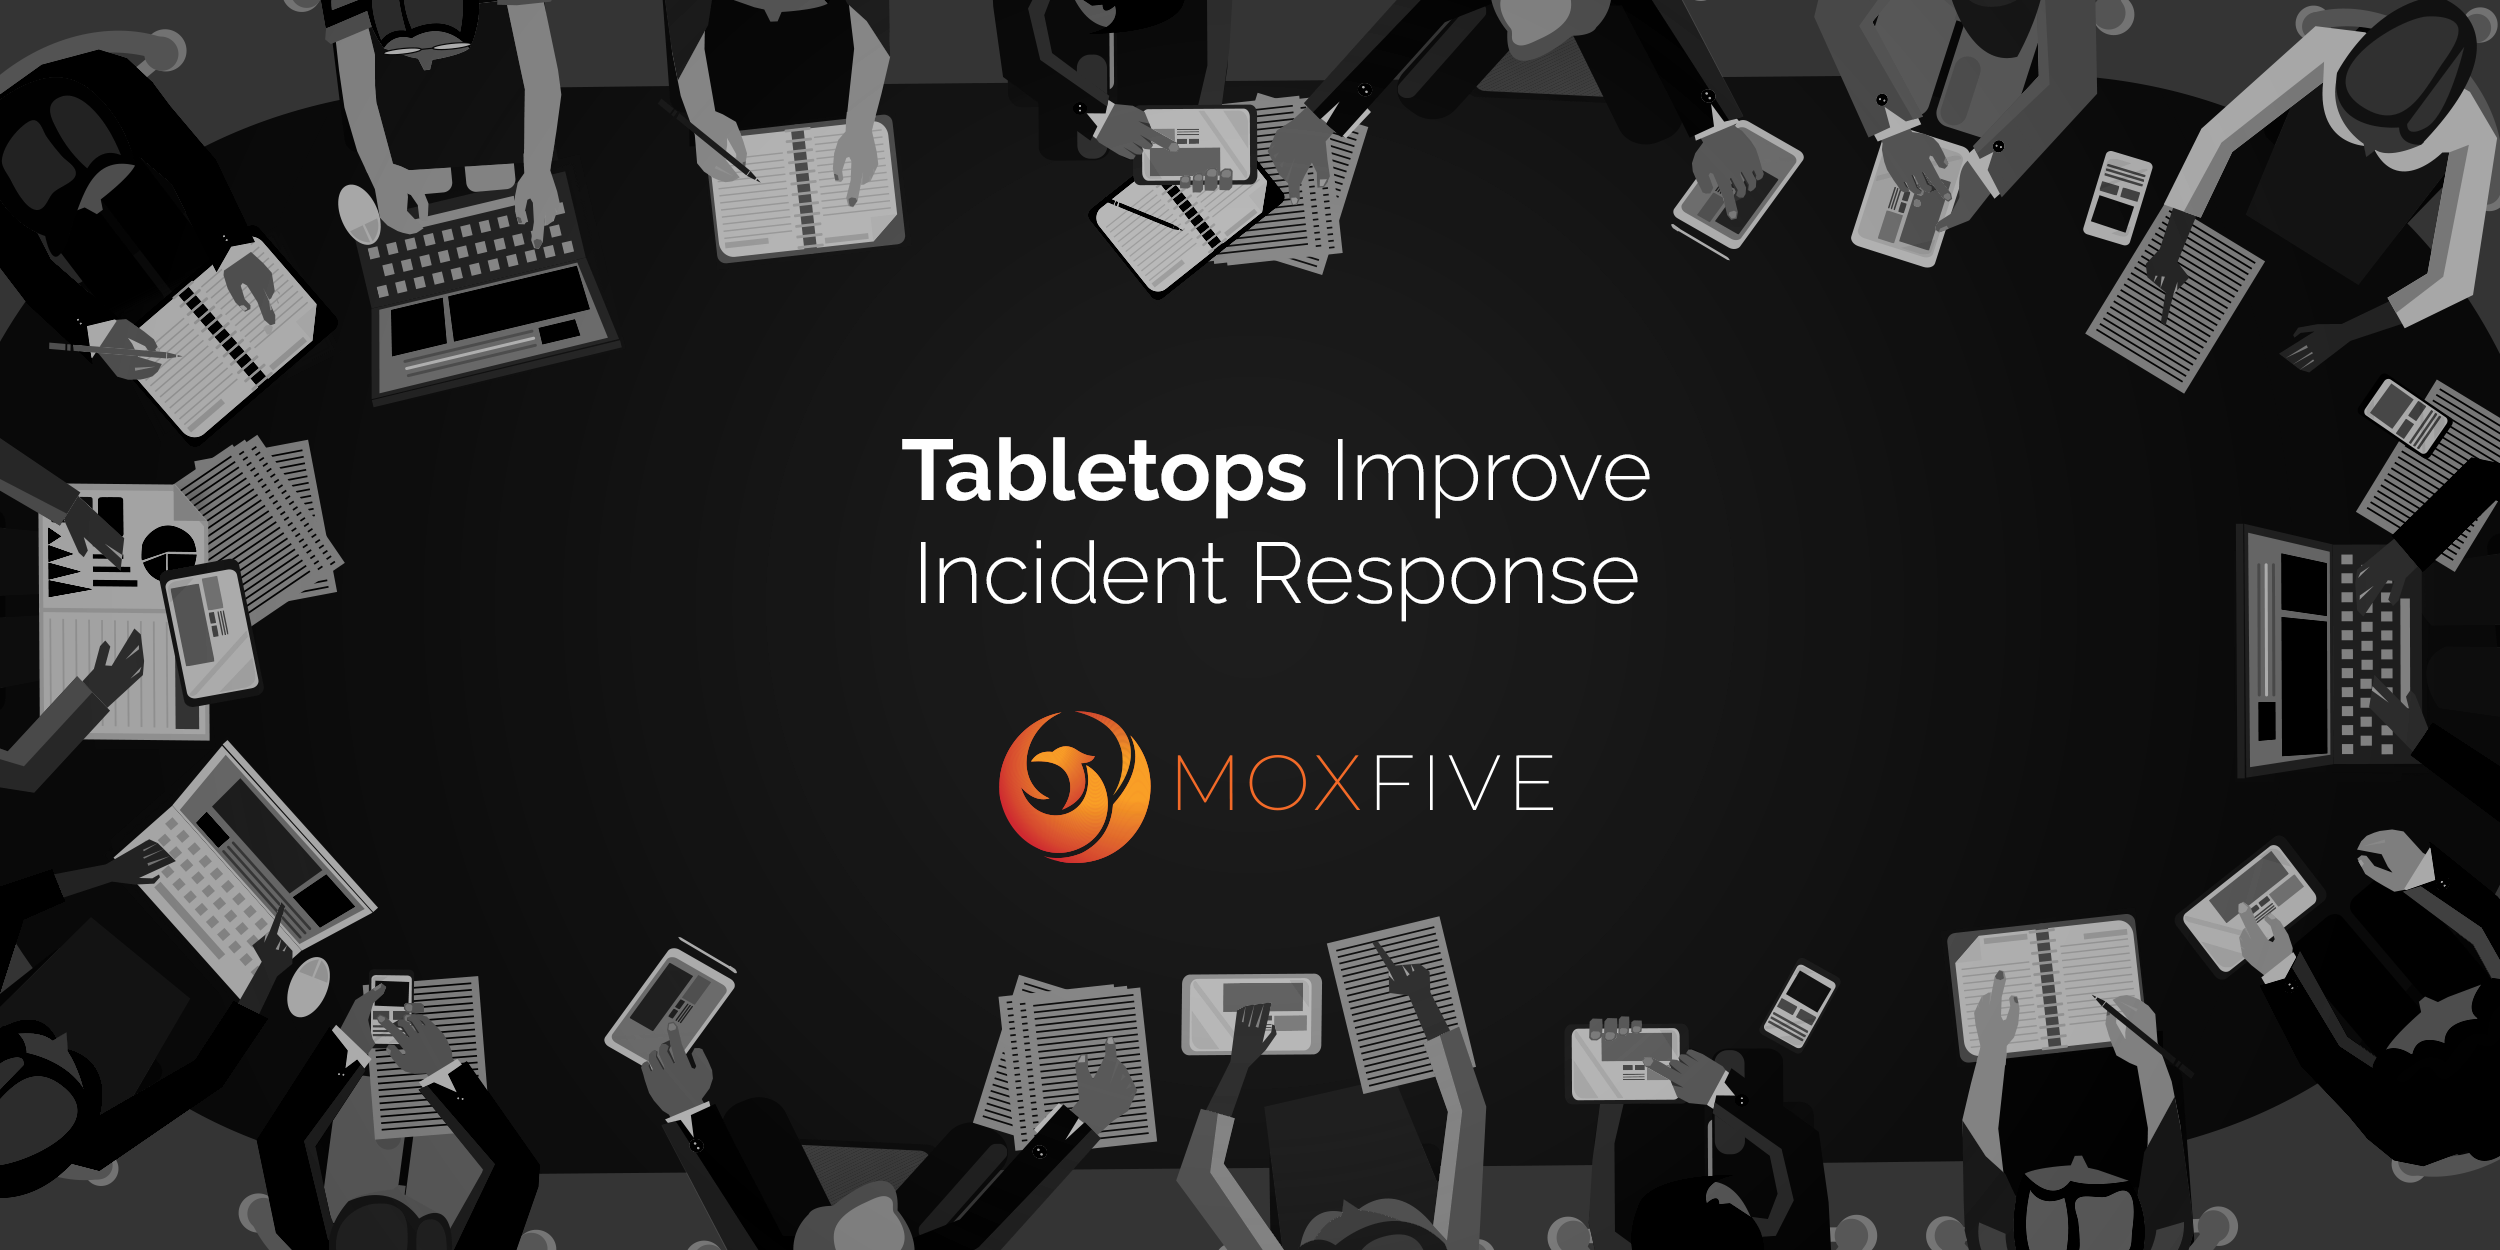 Tabletops Improve Incident Response